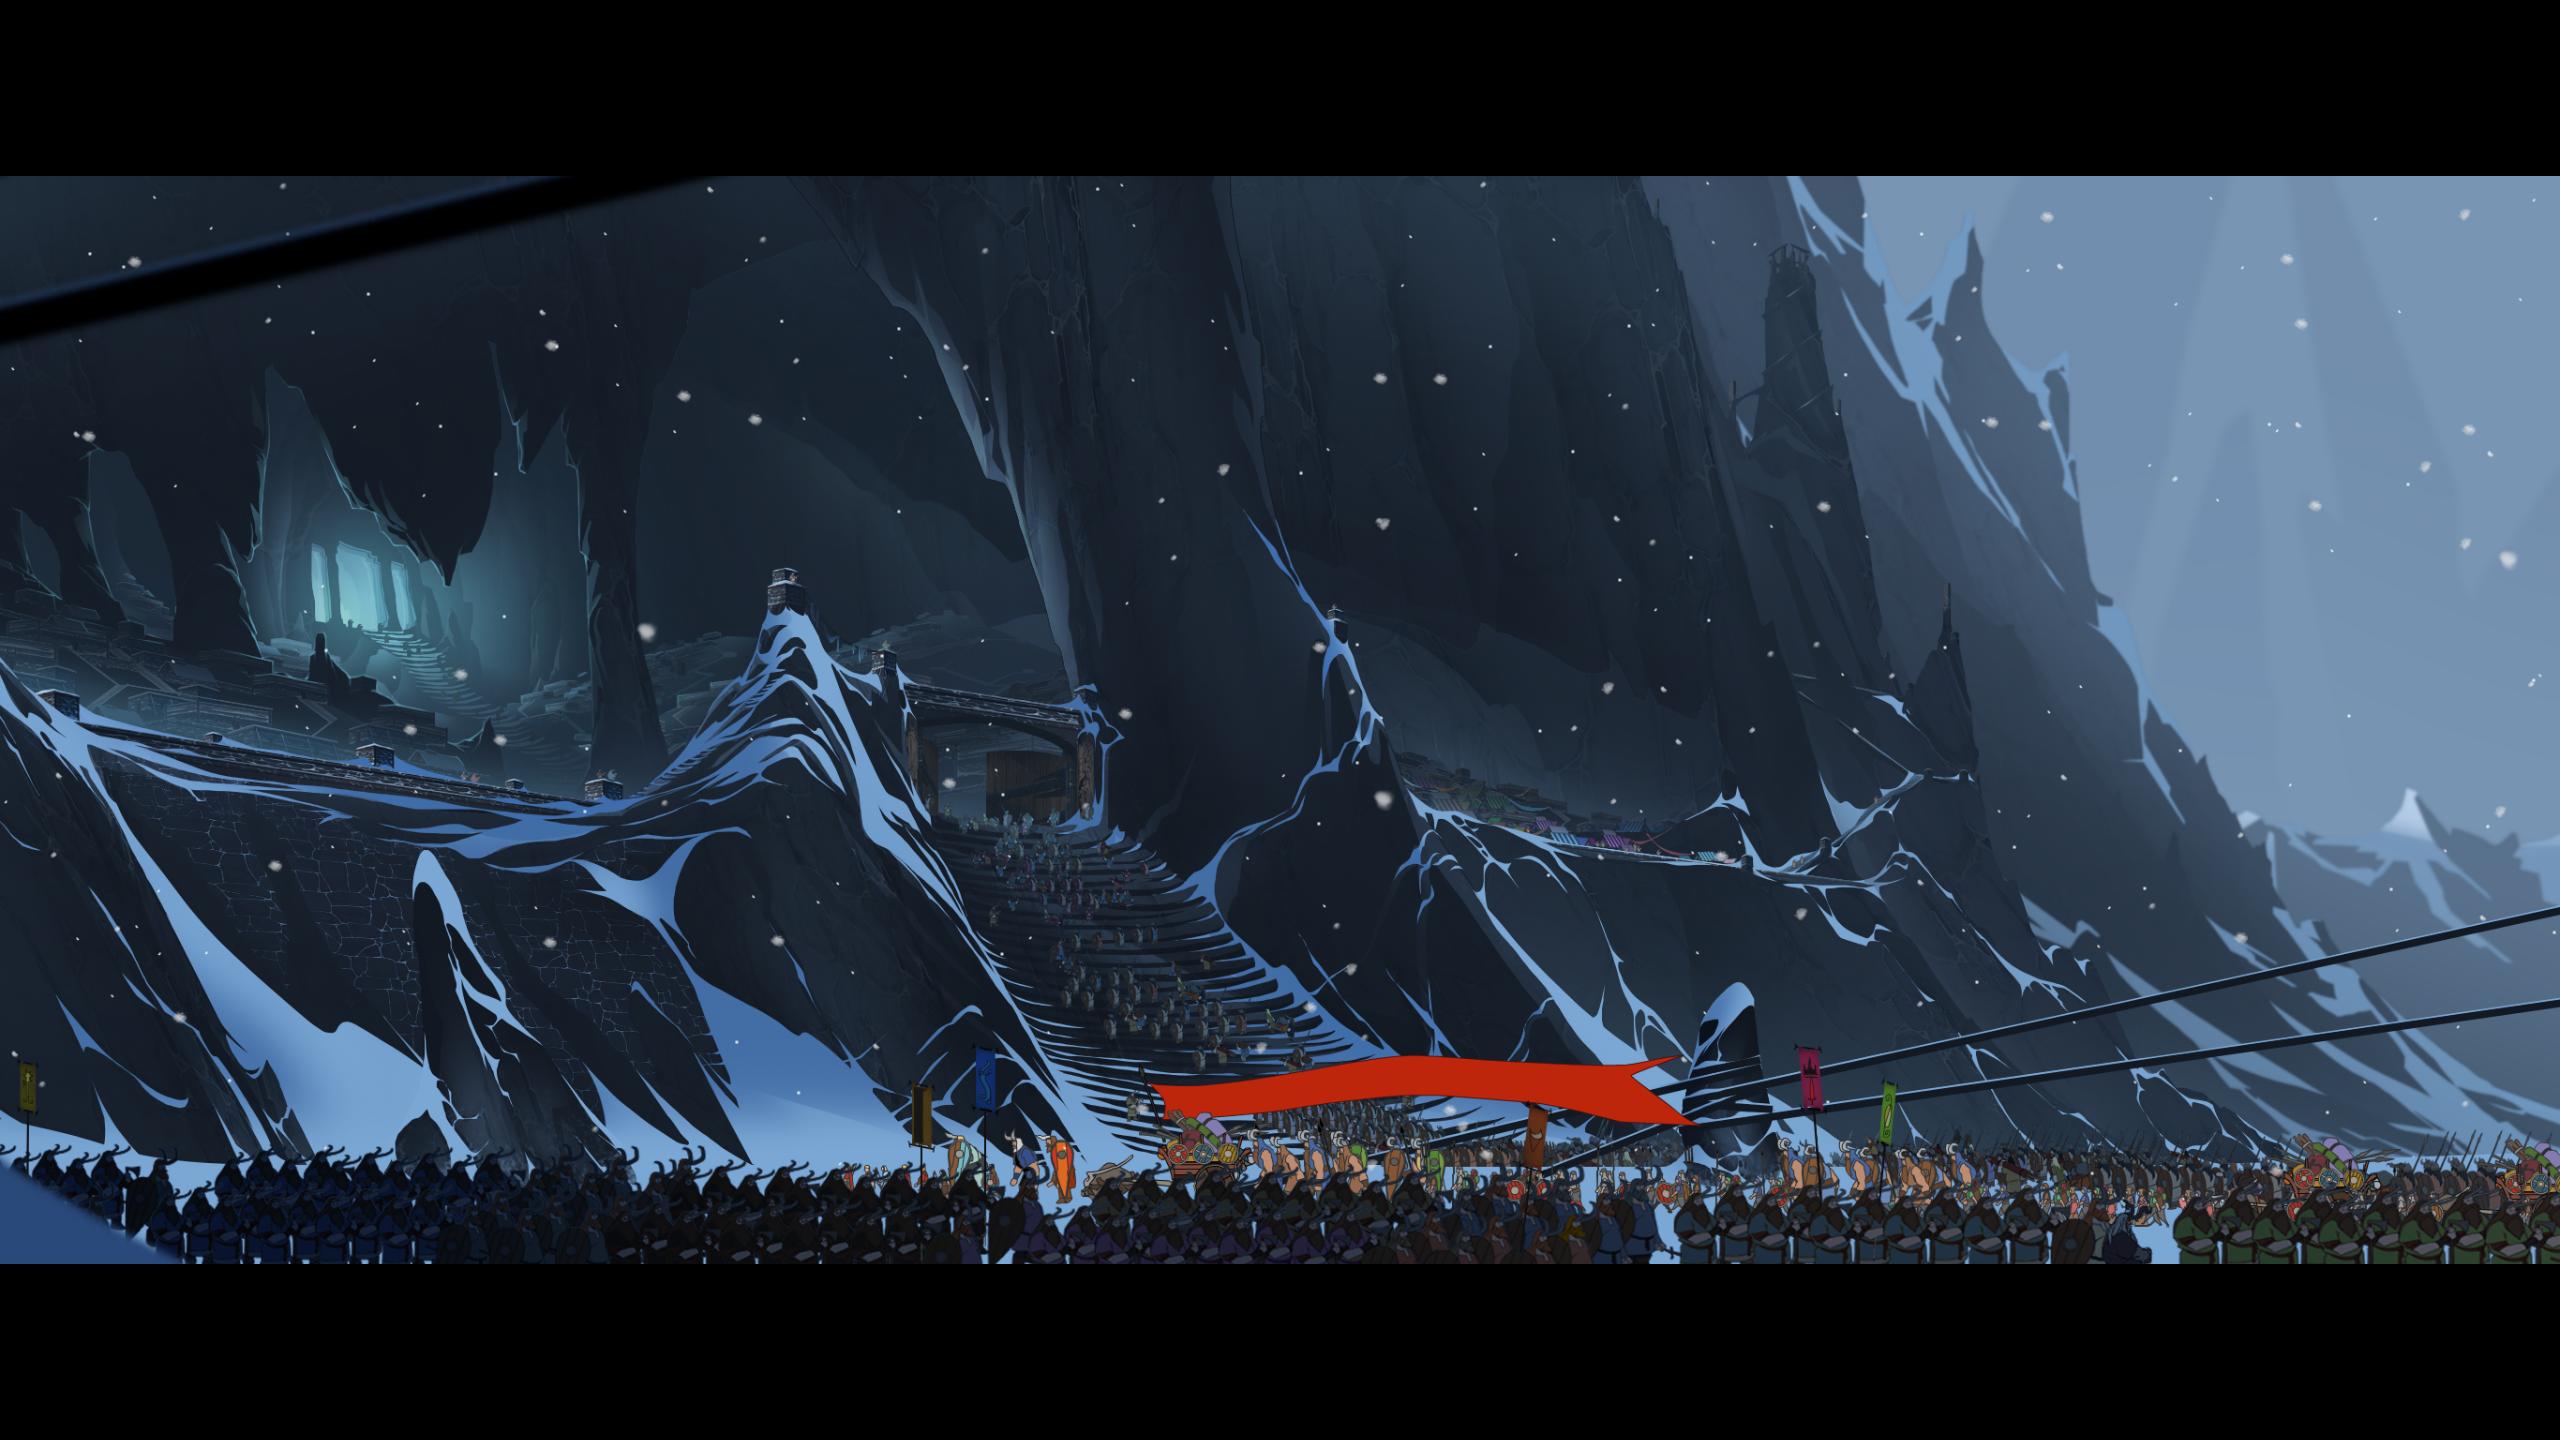 The Banner Saga HD Wallpaper Background Image 2560x1440 ID 2560x1440